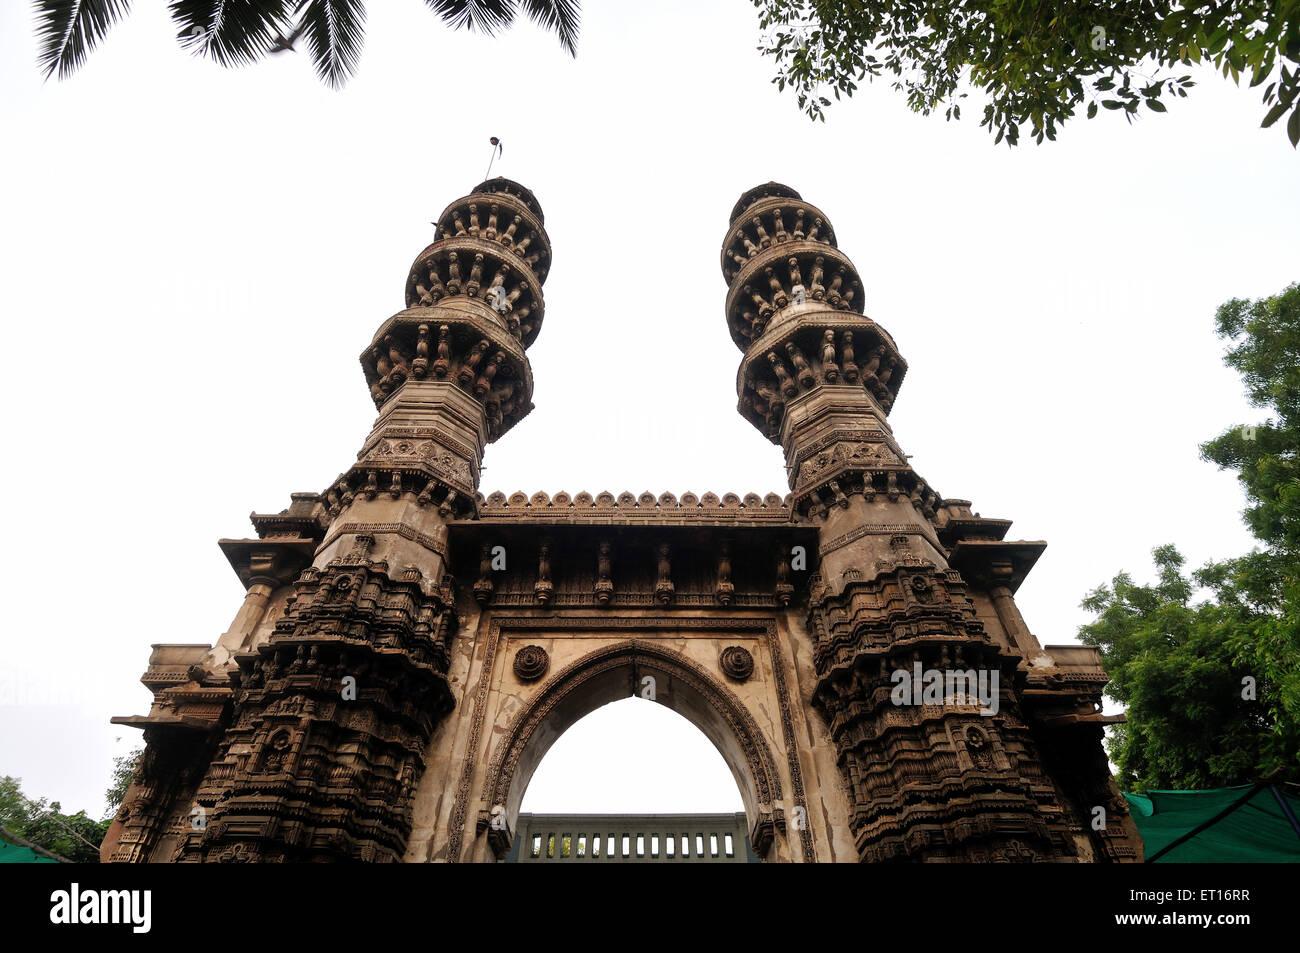 Jhulta Minar is located in Ahmedabad Gujarat India Asia - Stock Image